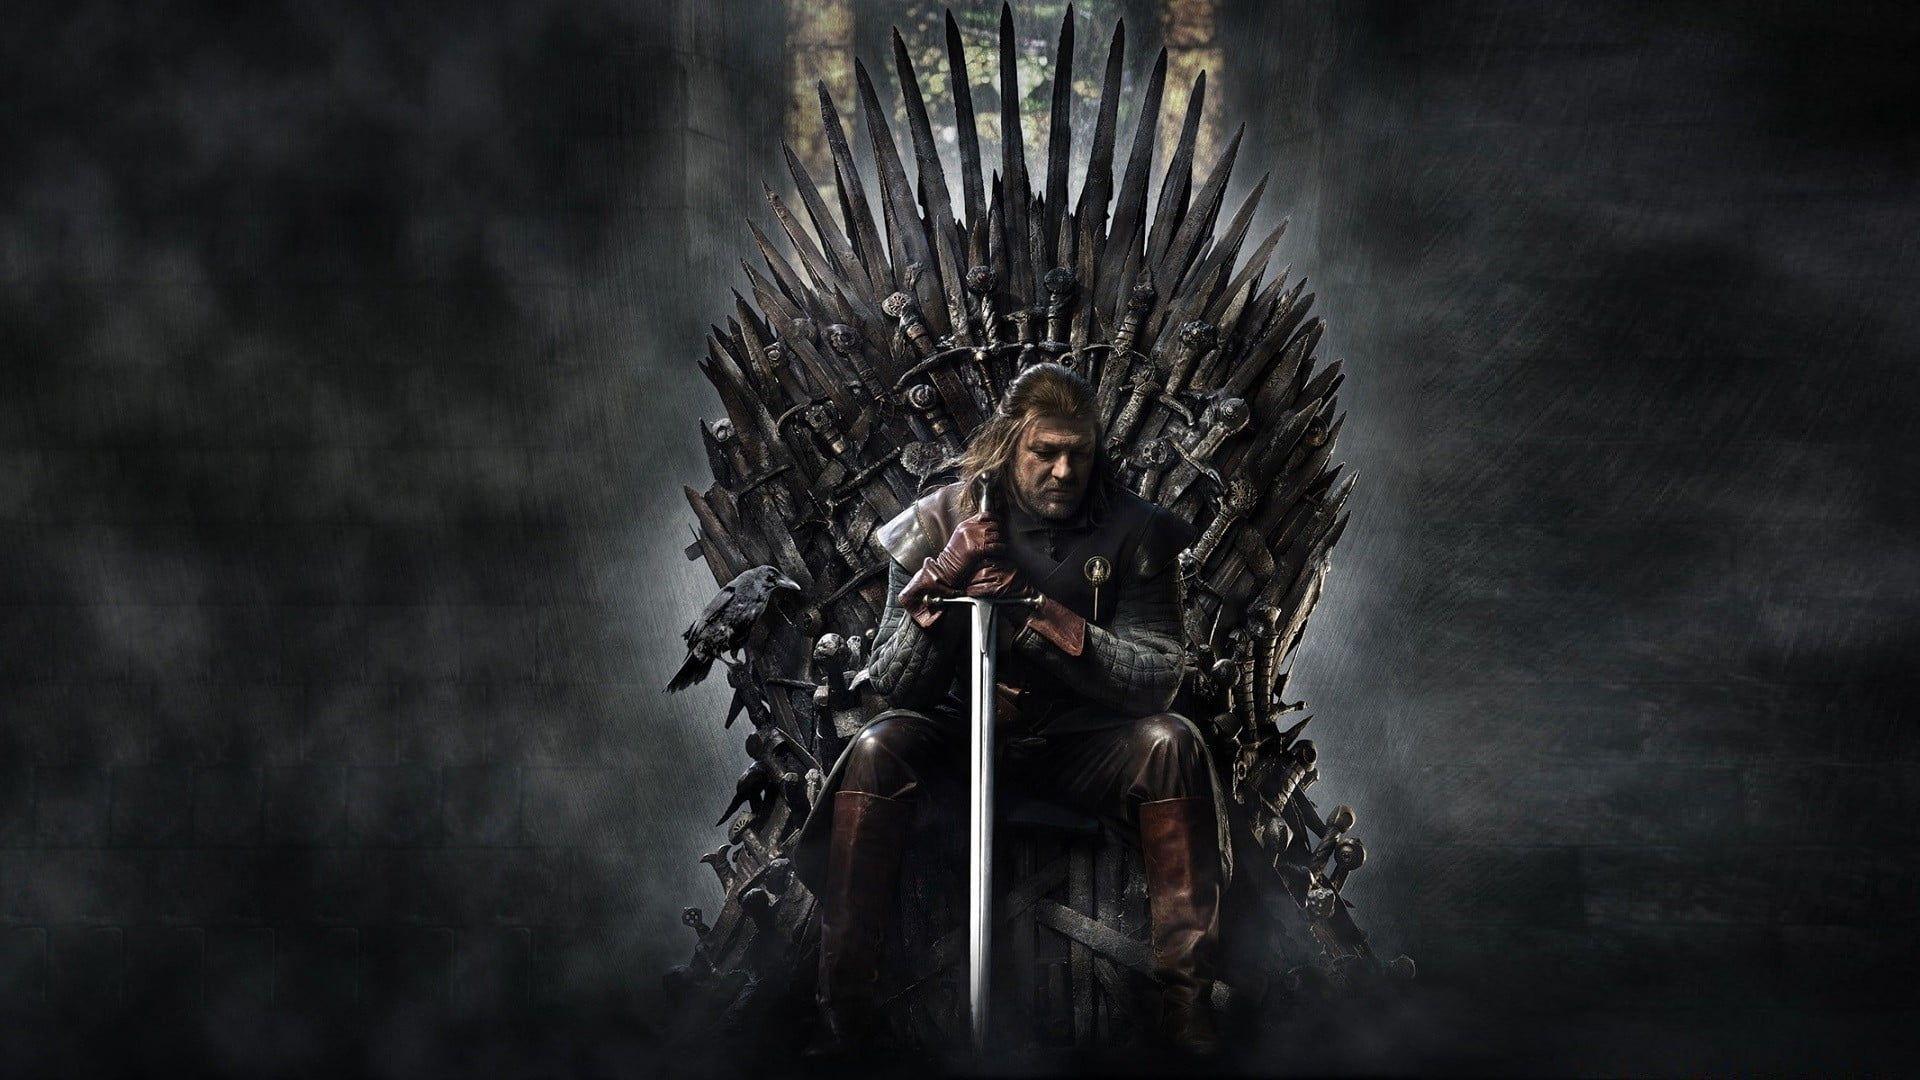 Game Of Thrones Eddard Stark Sean Bean Iron Throne Sword Game Of Thrones 1080p Wallpaper Hdwallpaper Desktop Iron Throne Game Of Thrones Poster Stark